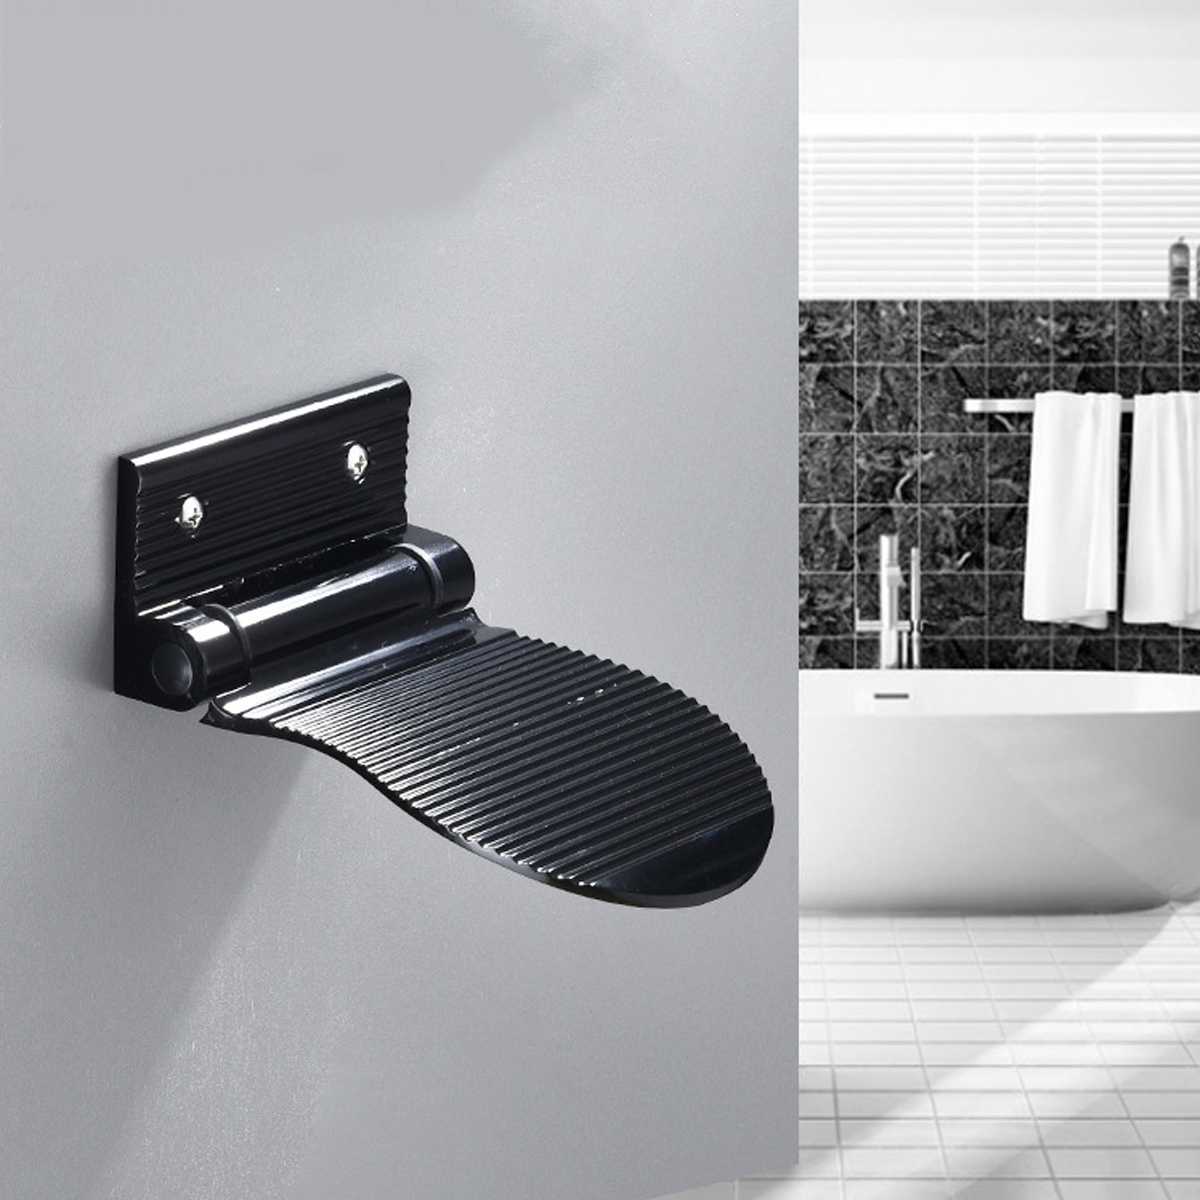 Details about  /Ellen Shower Foot Rest Bathroom Pedals Non-slip Shower Footstool Pedestal Pedals